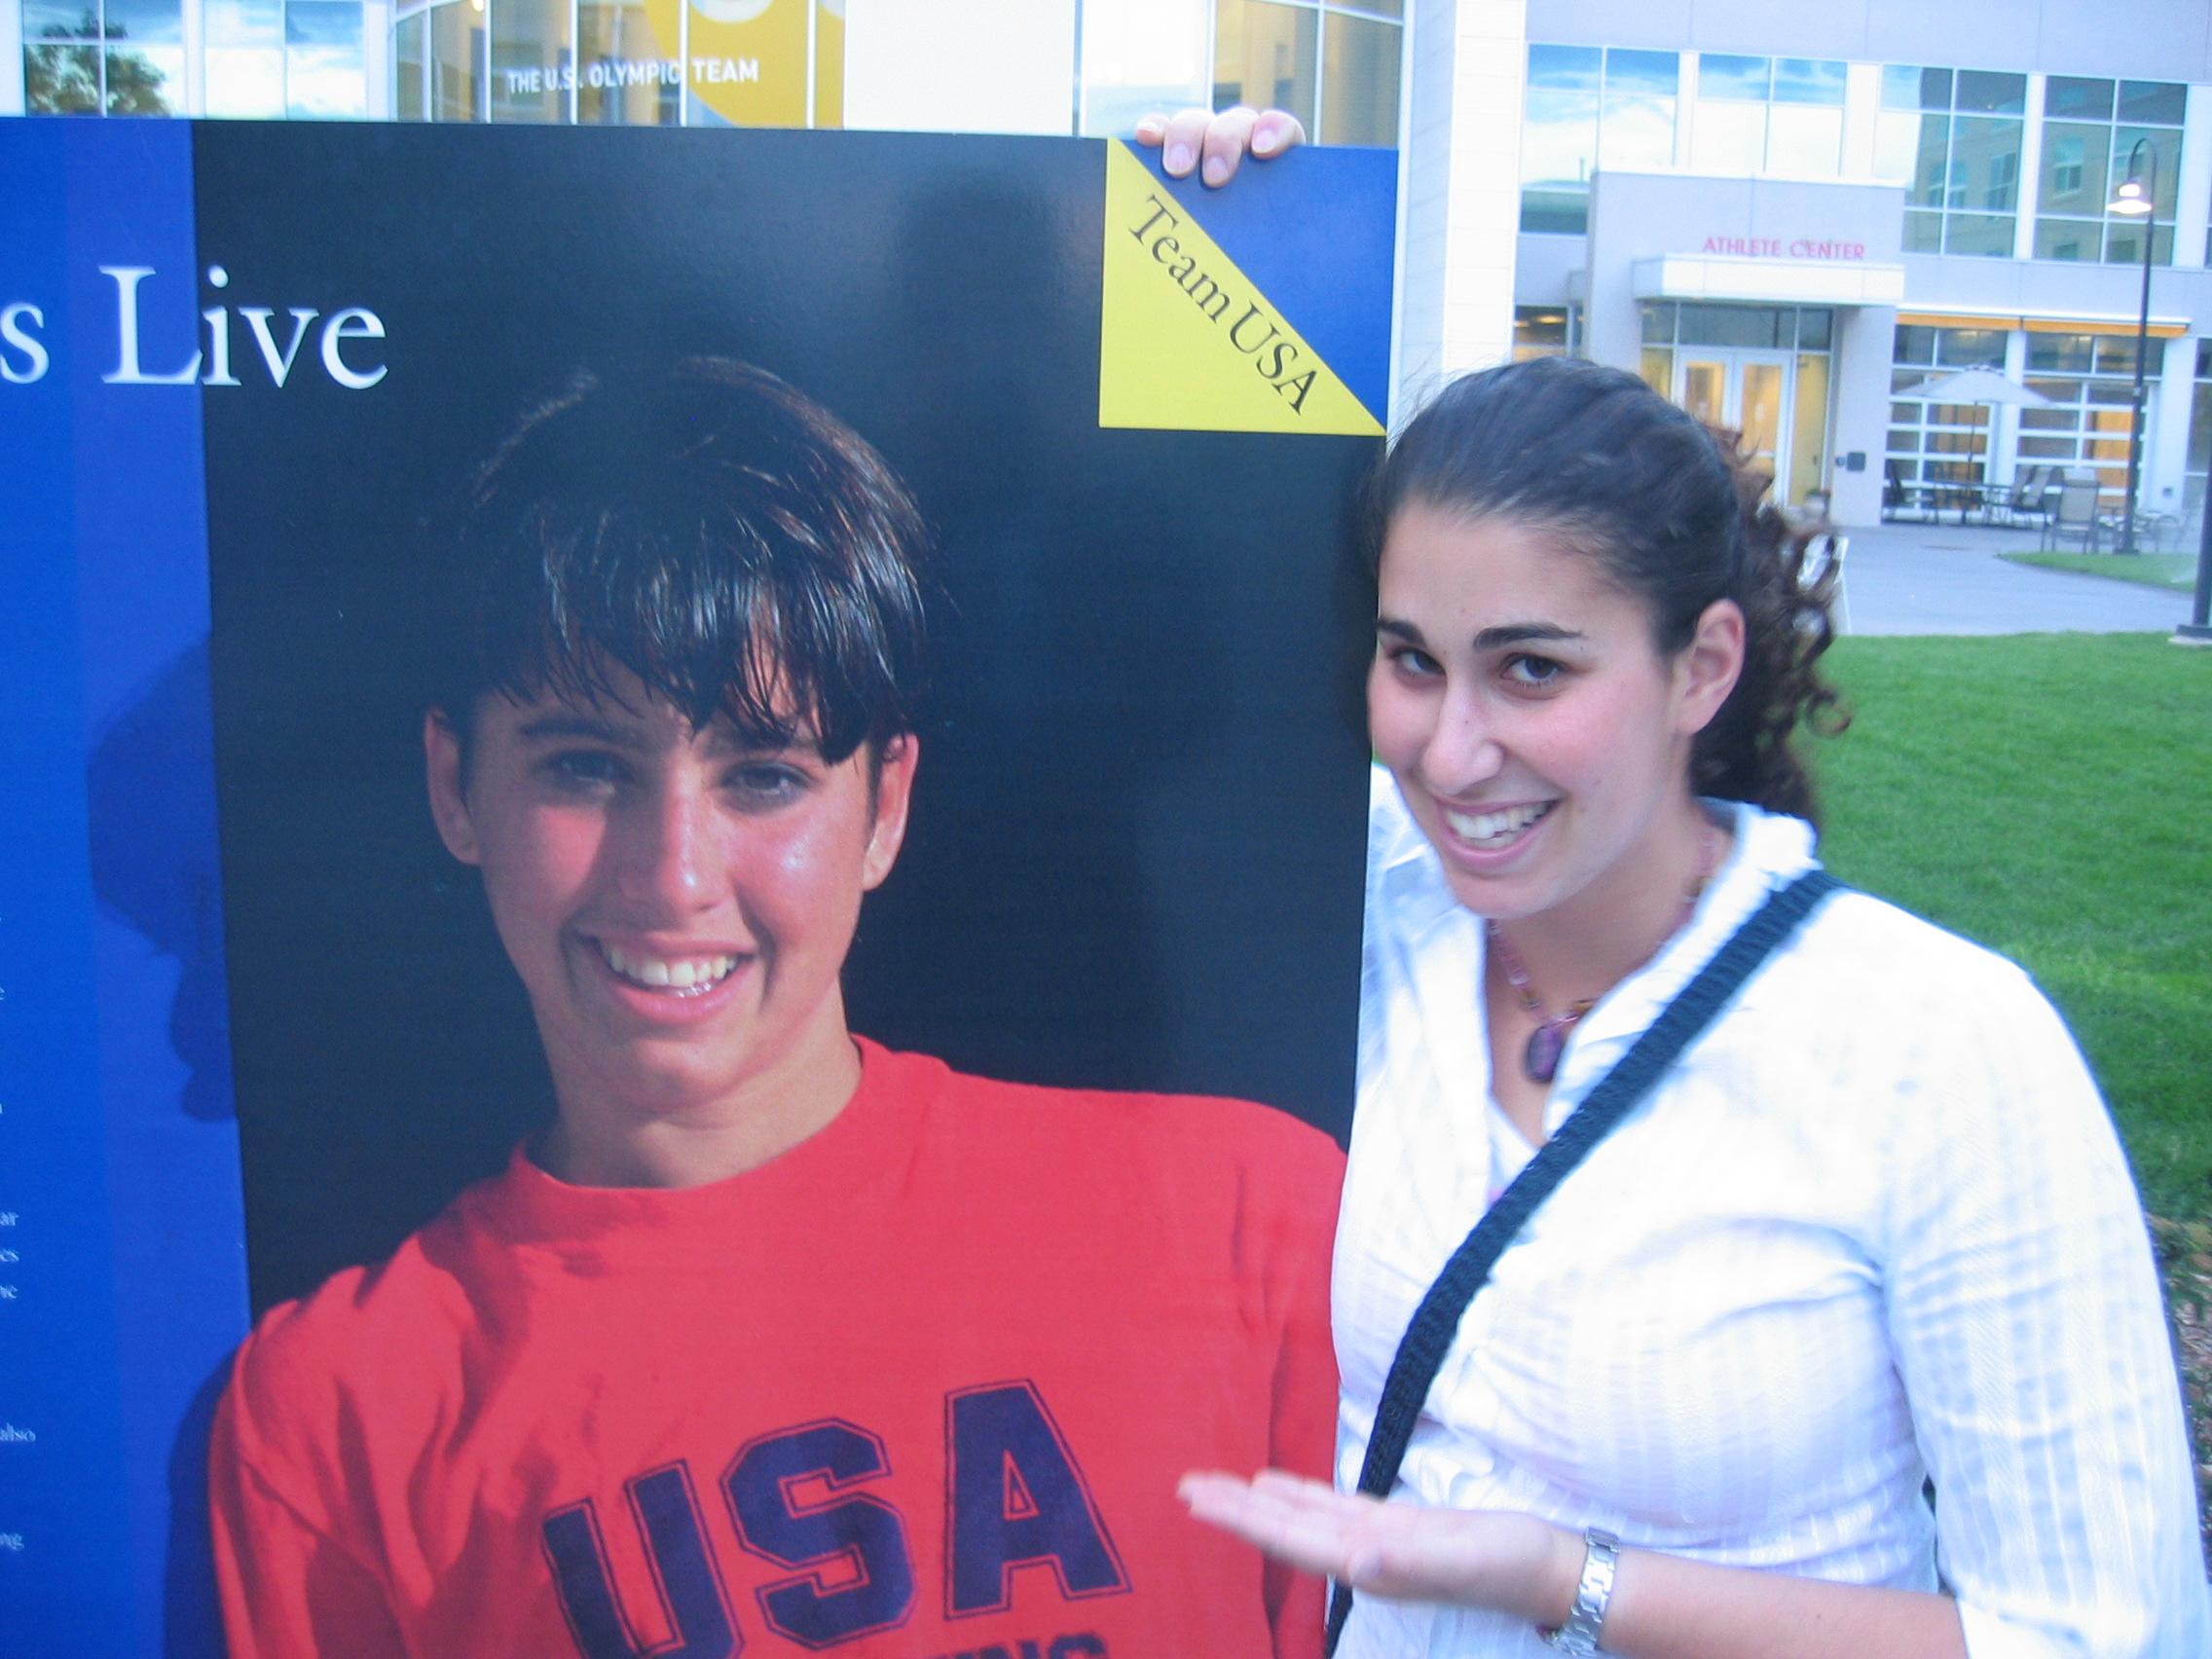 Olympic Training Center 023.jpg